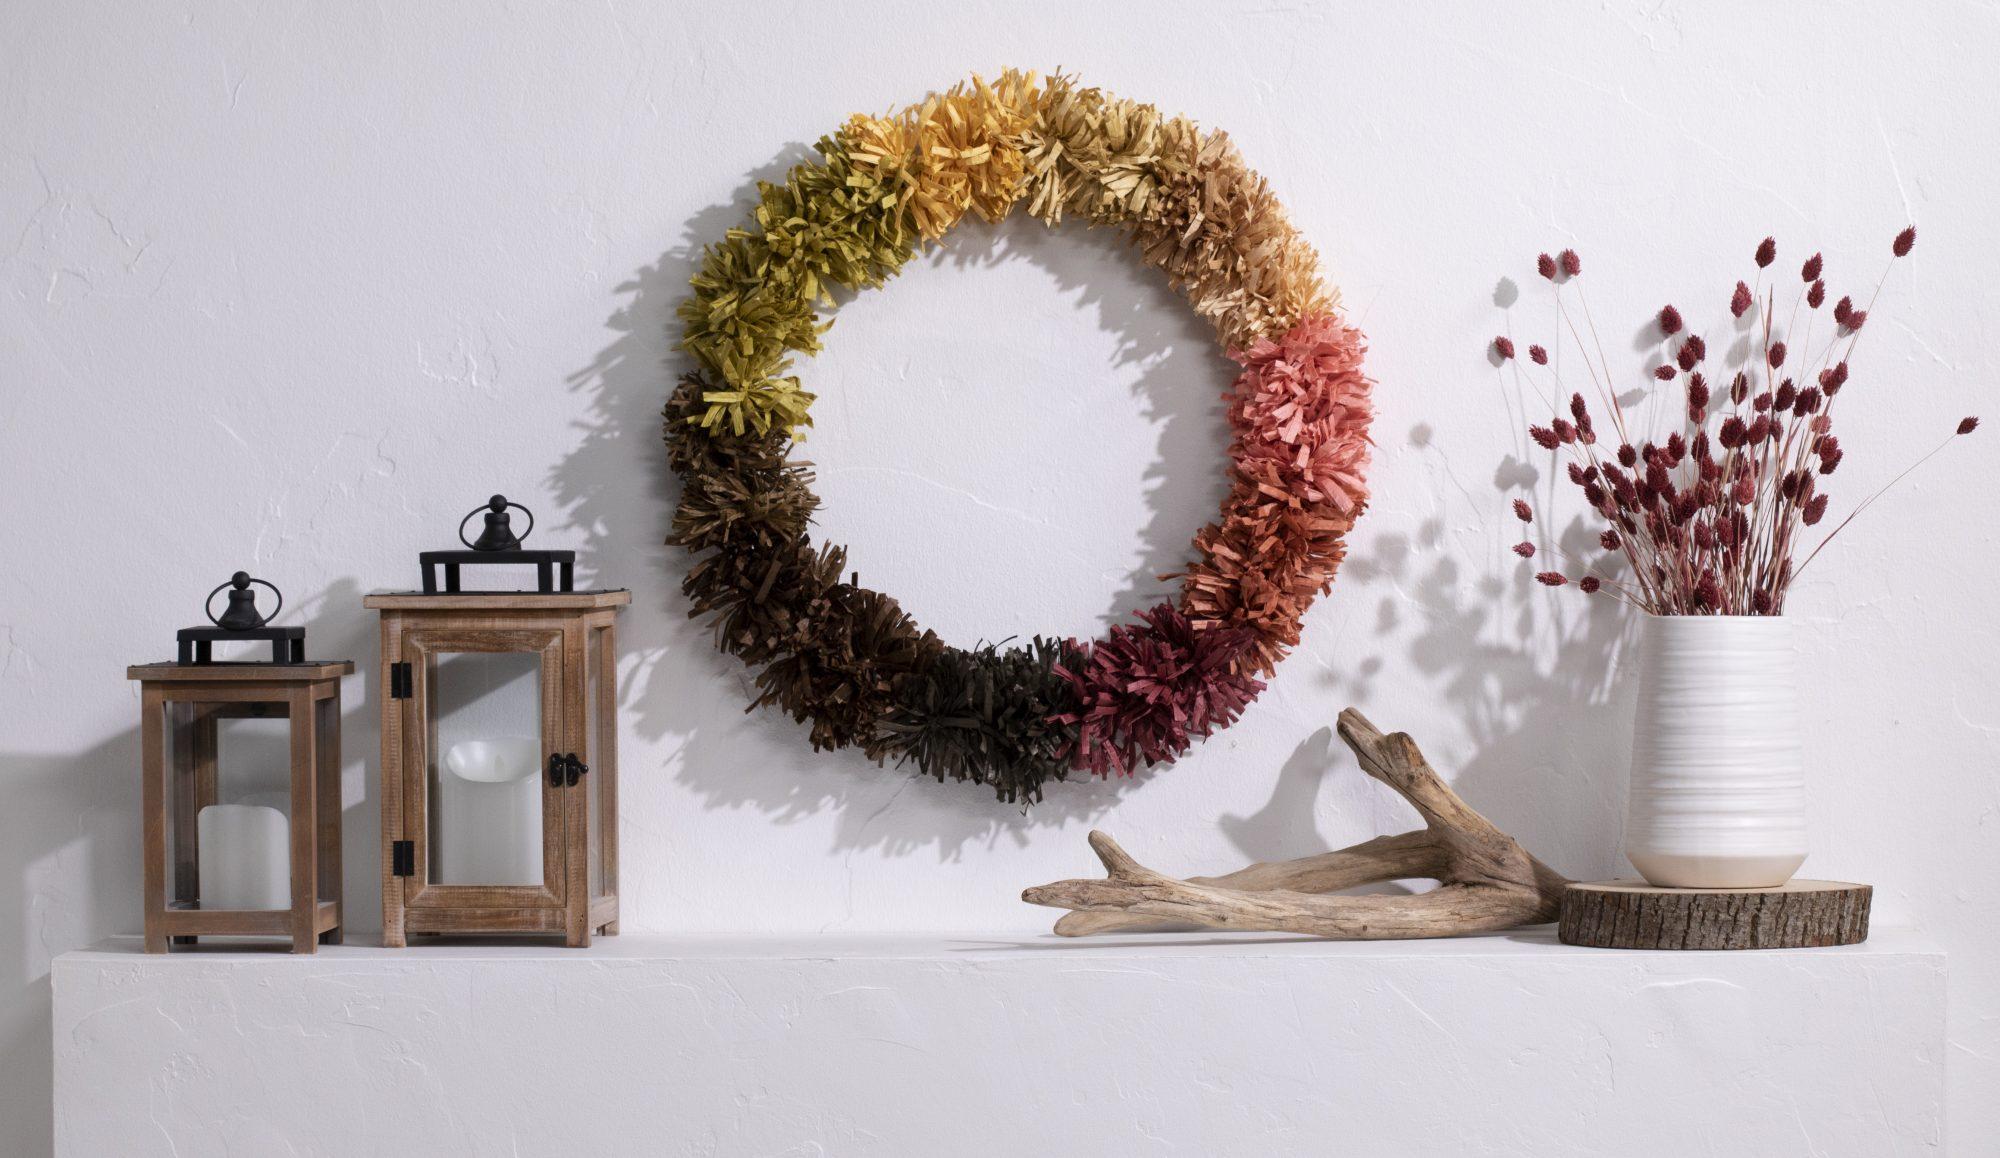 Paper raffia wreath above mantel